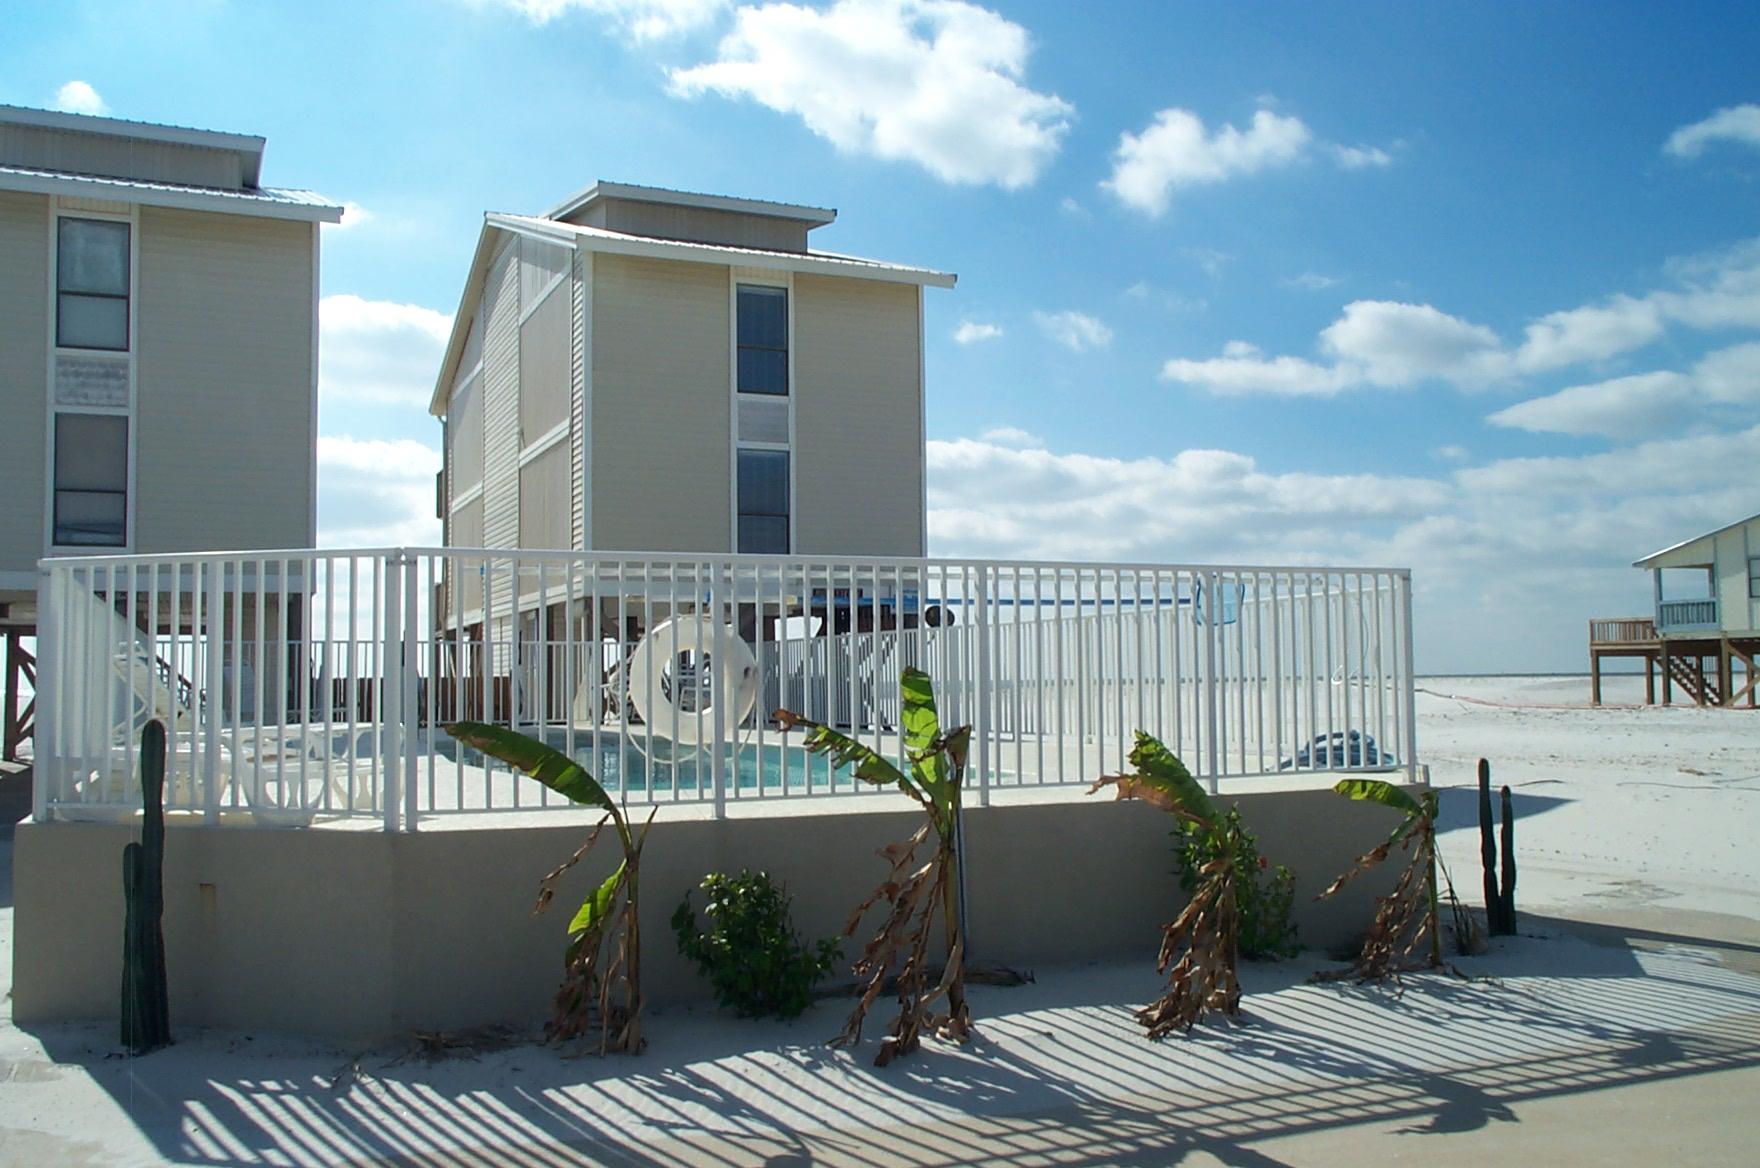 Awbrey House House/Cottage rental in Gulf Shores House Rentals in Gulf Shores Alabama - #6